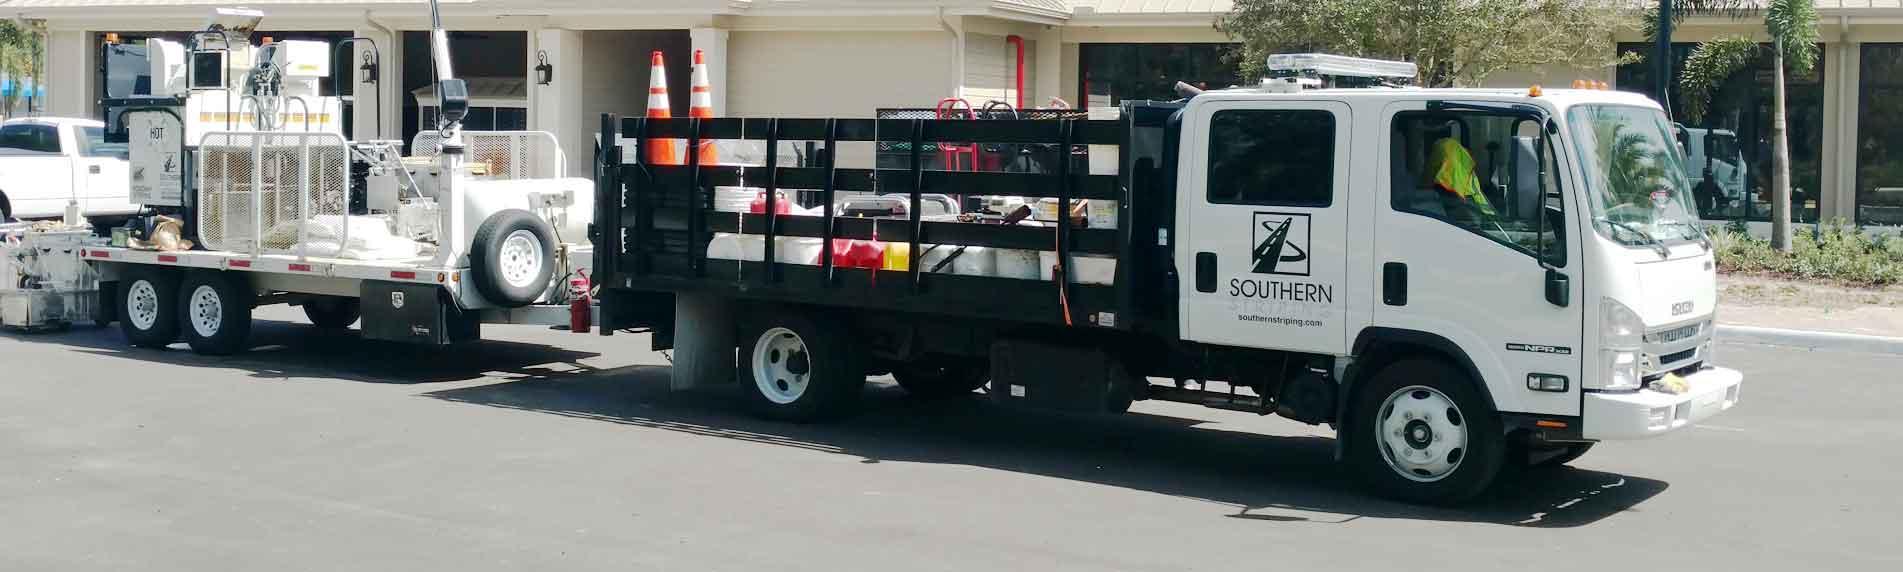 Southern Striping striping, sealcoating and asphalt repair service truck - Southern Striping, LLC